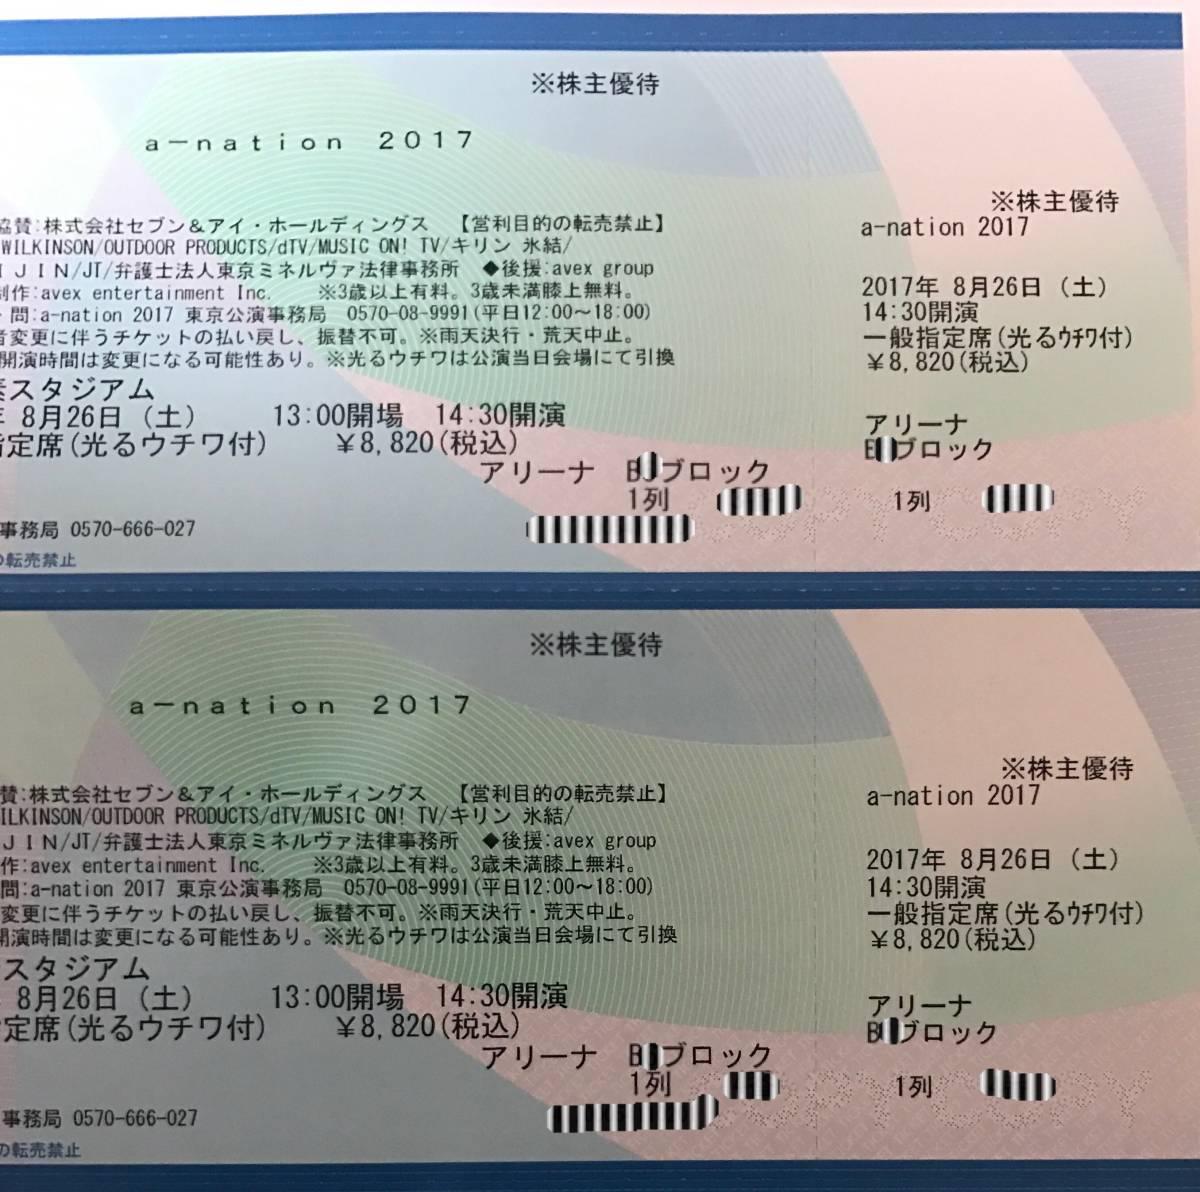 a-nation 8/26 アリーナB6~B12 1列連番 ペア価格② AAA EXILE 超特急 EXO